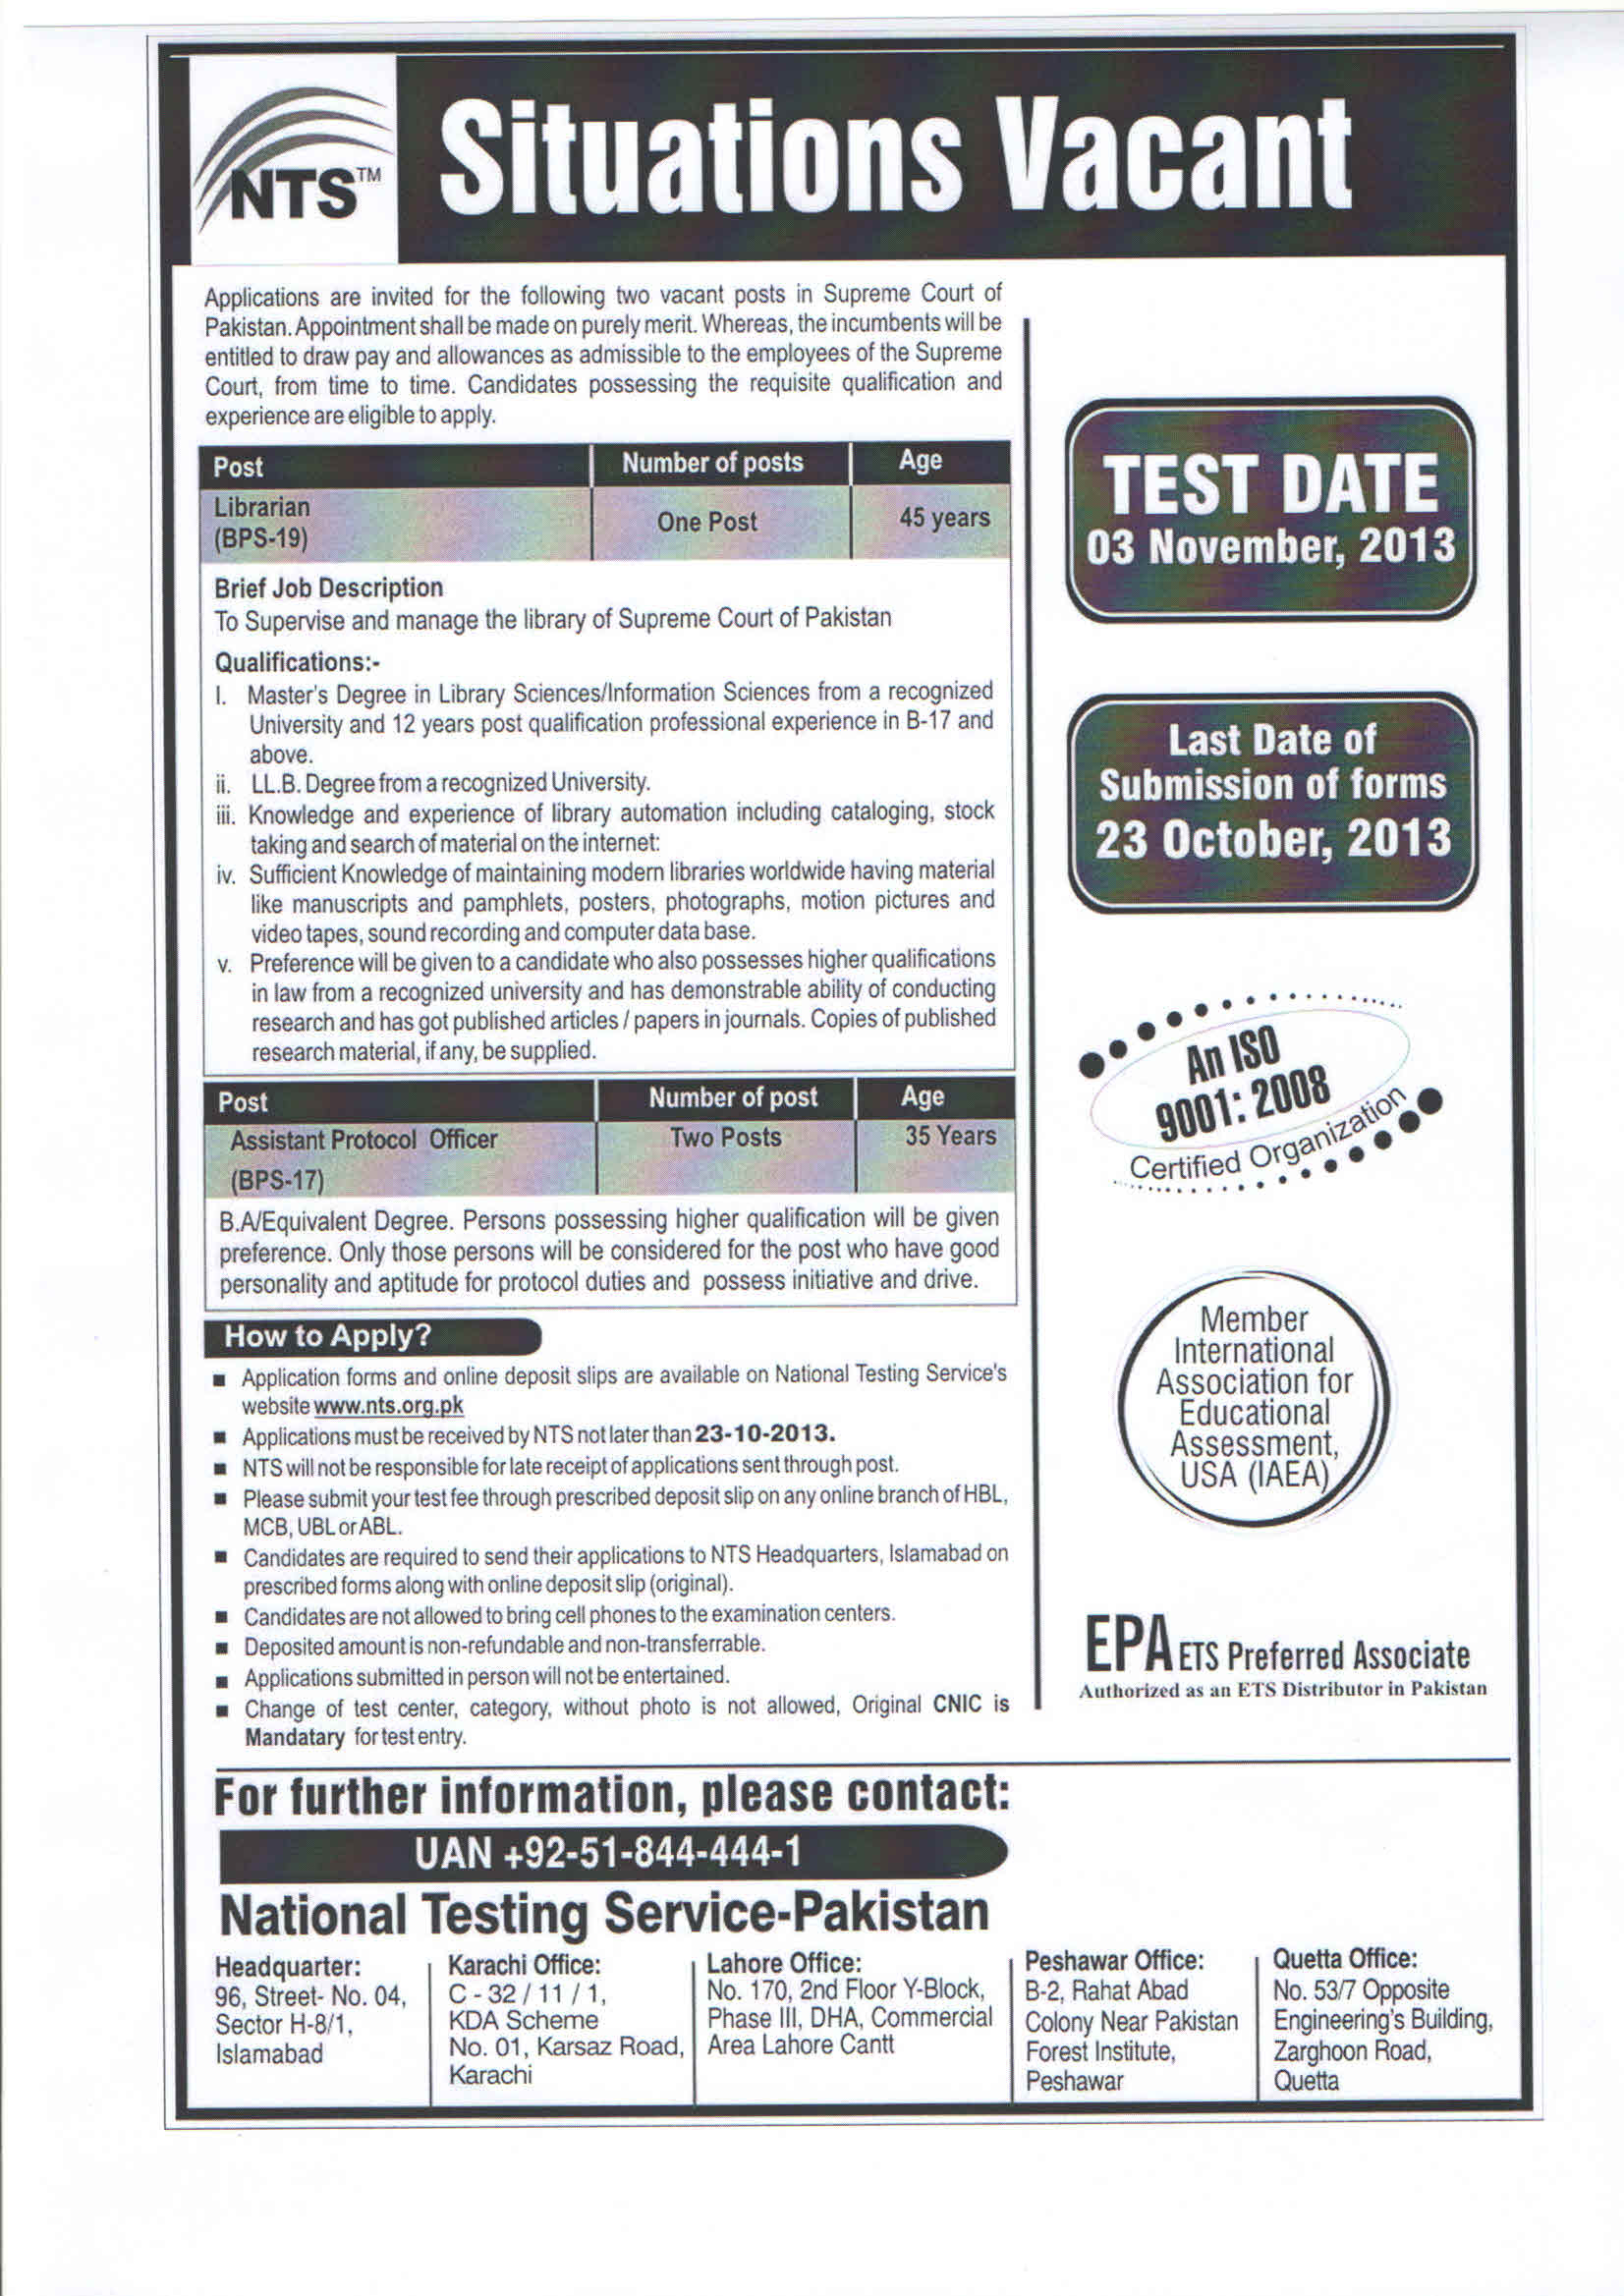 NTS Supreme Court of Pakistan Recruitment Test Result 2013